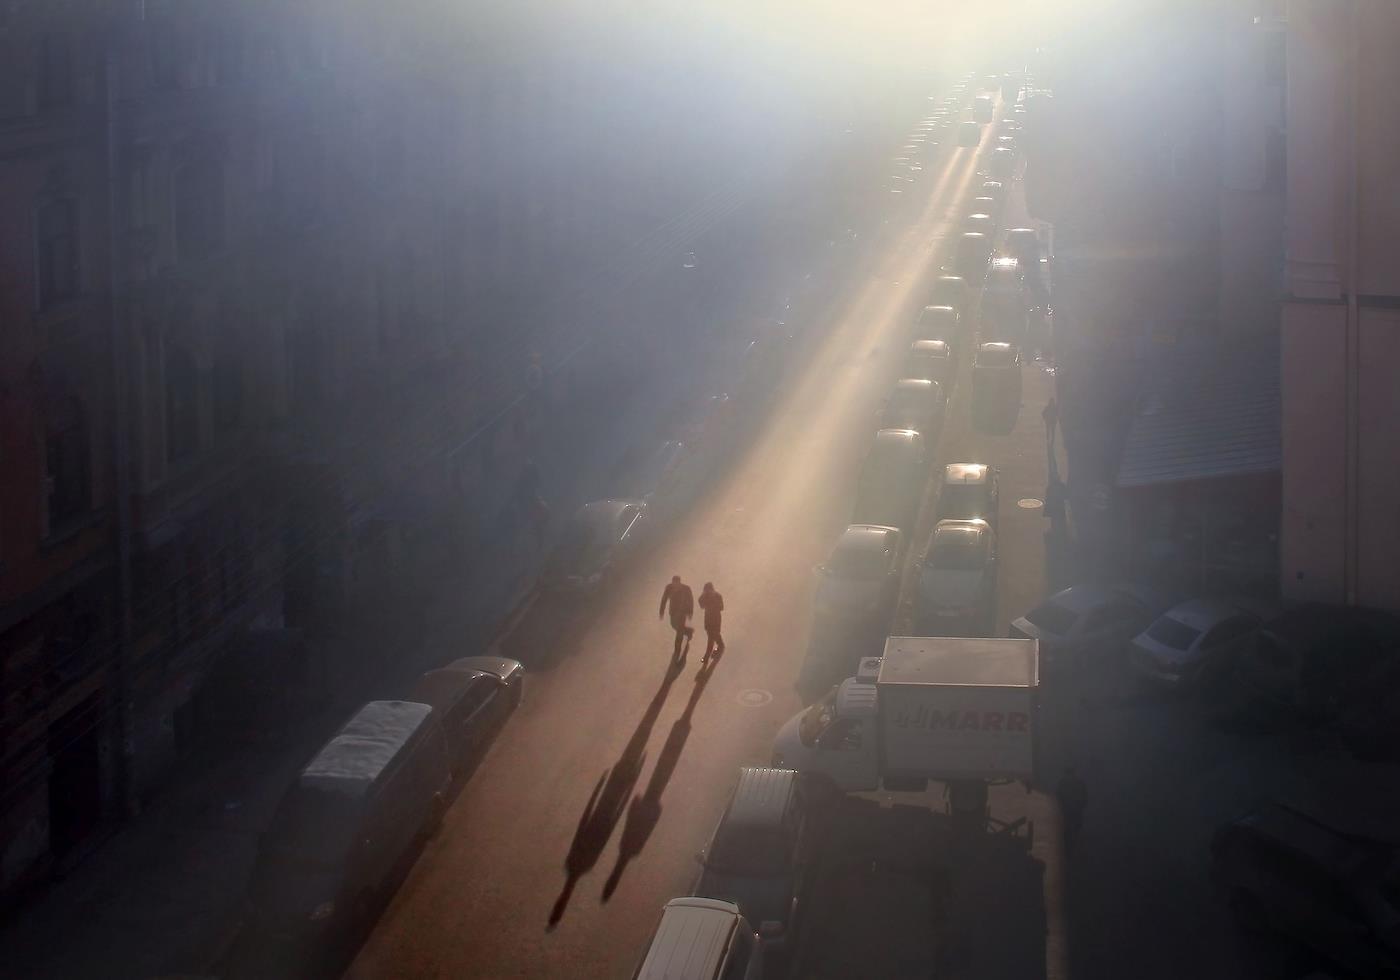 автор фото Александр Петросян/Коммерсантъ